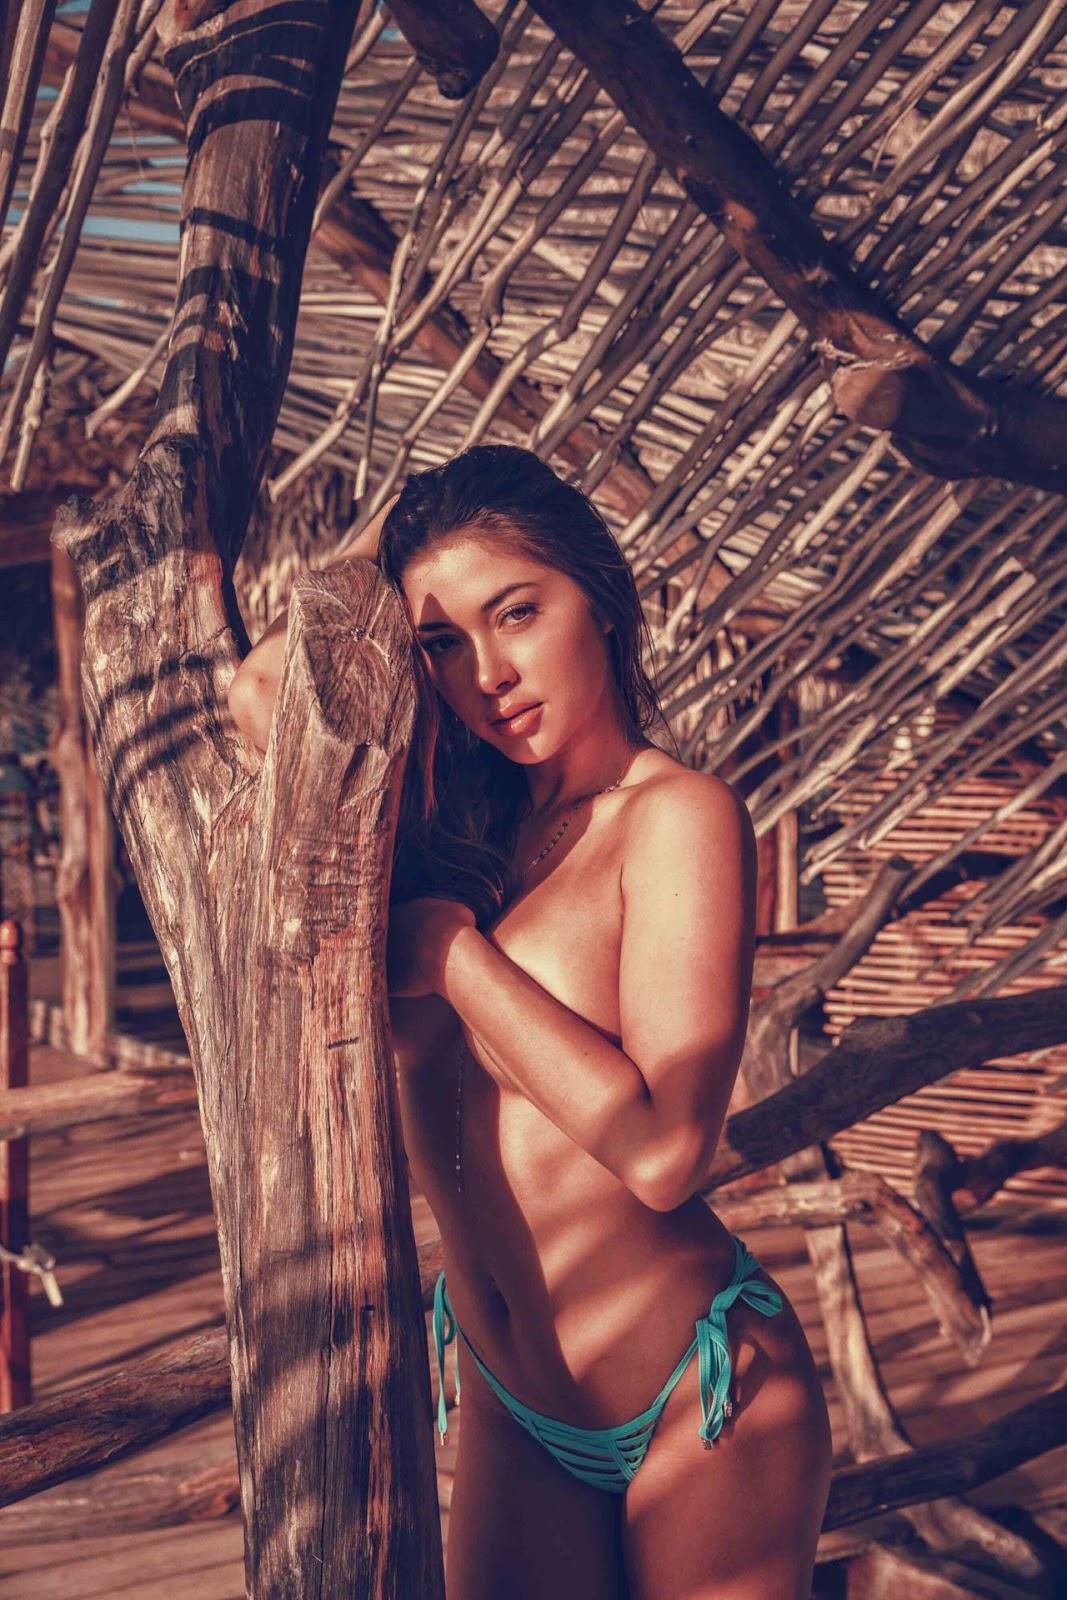 photo Celine farach photoshoot with cameron uranick 2019